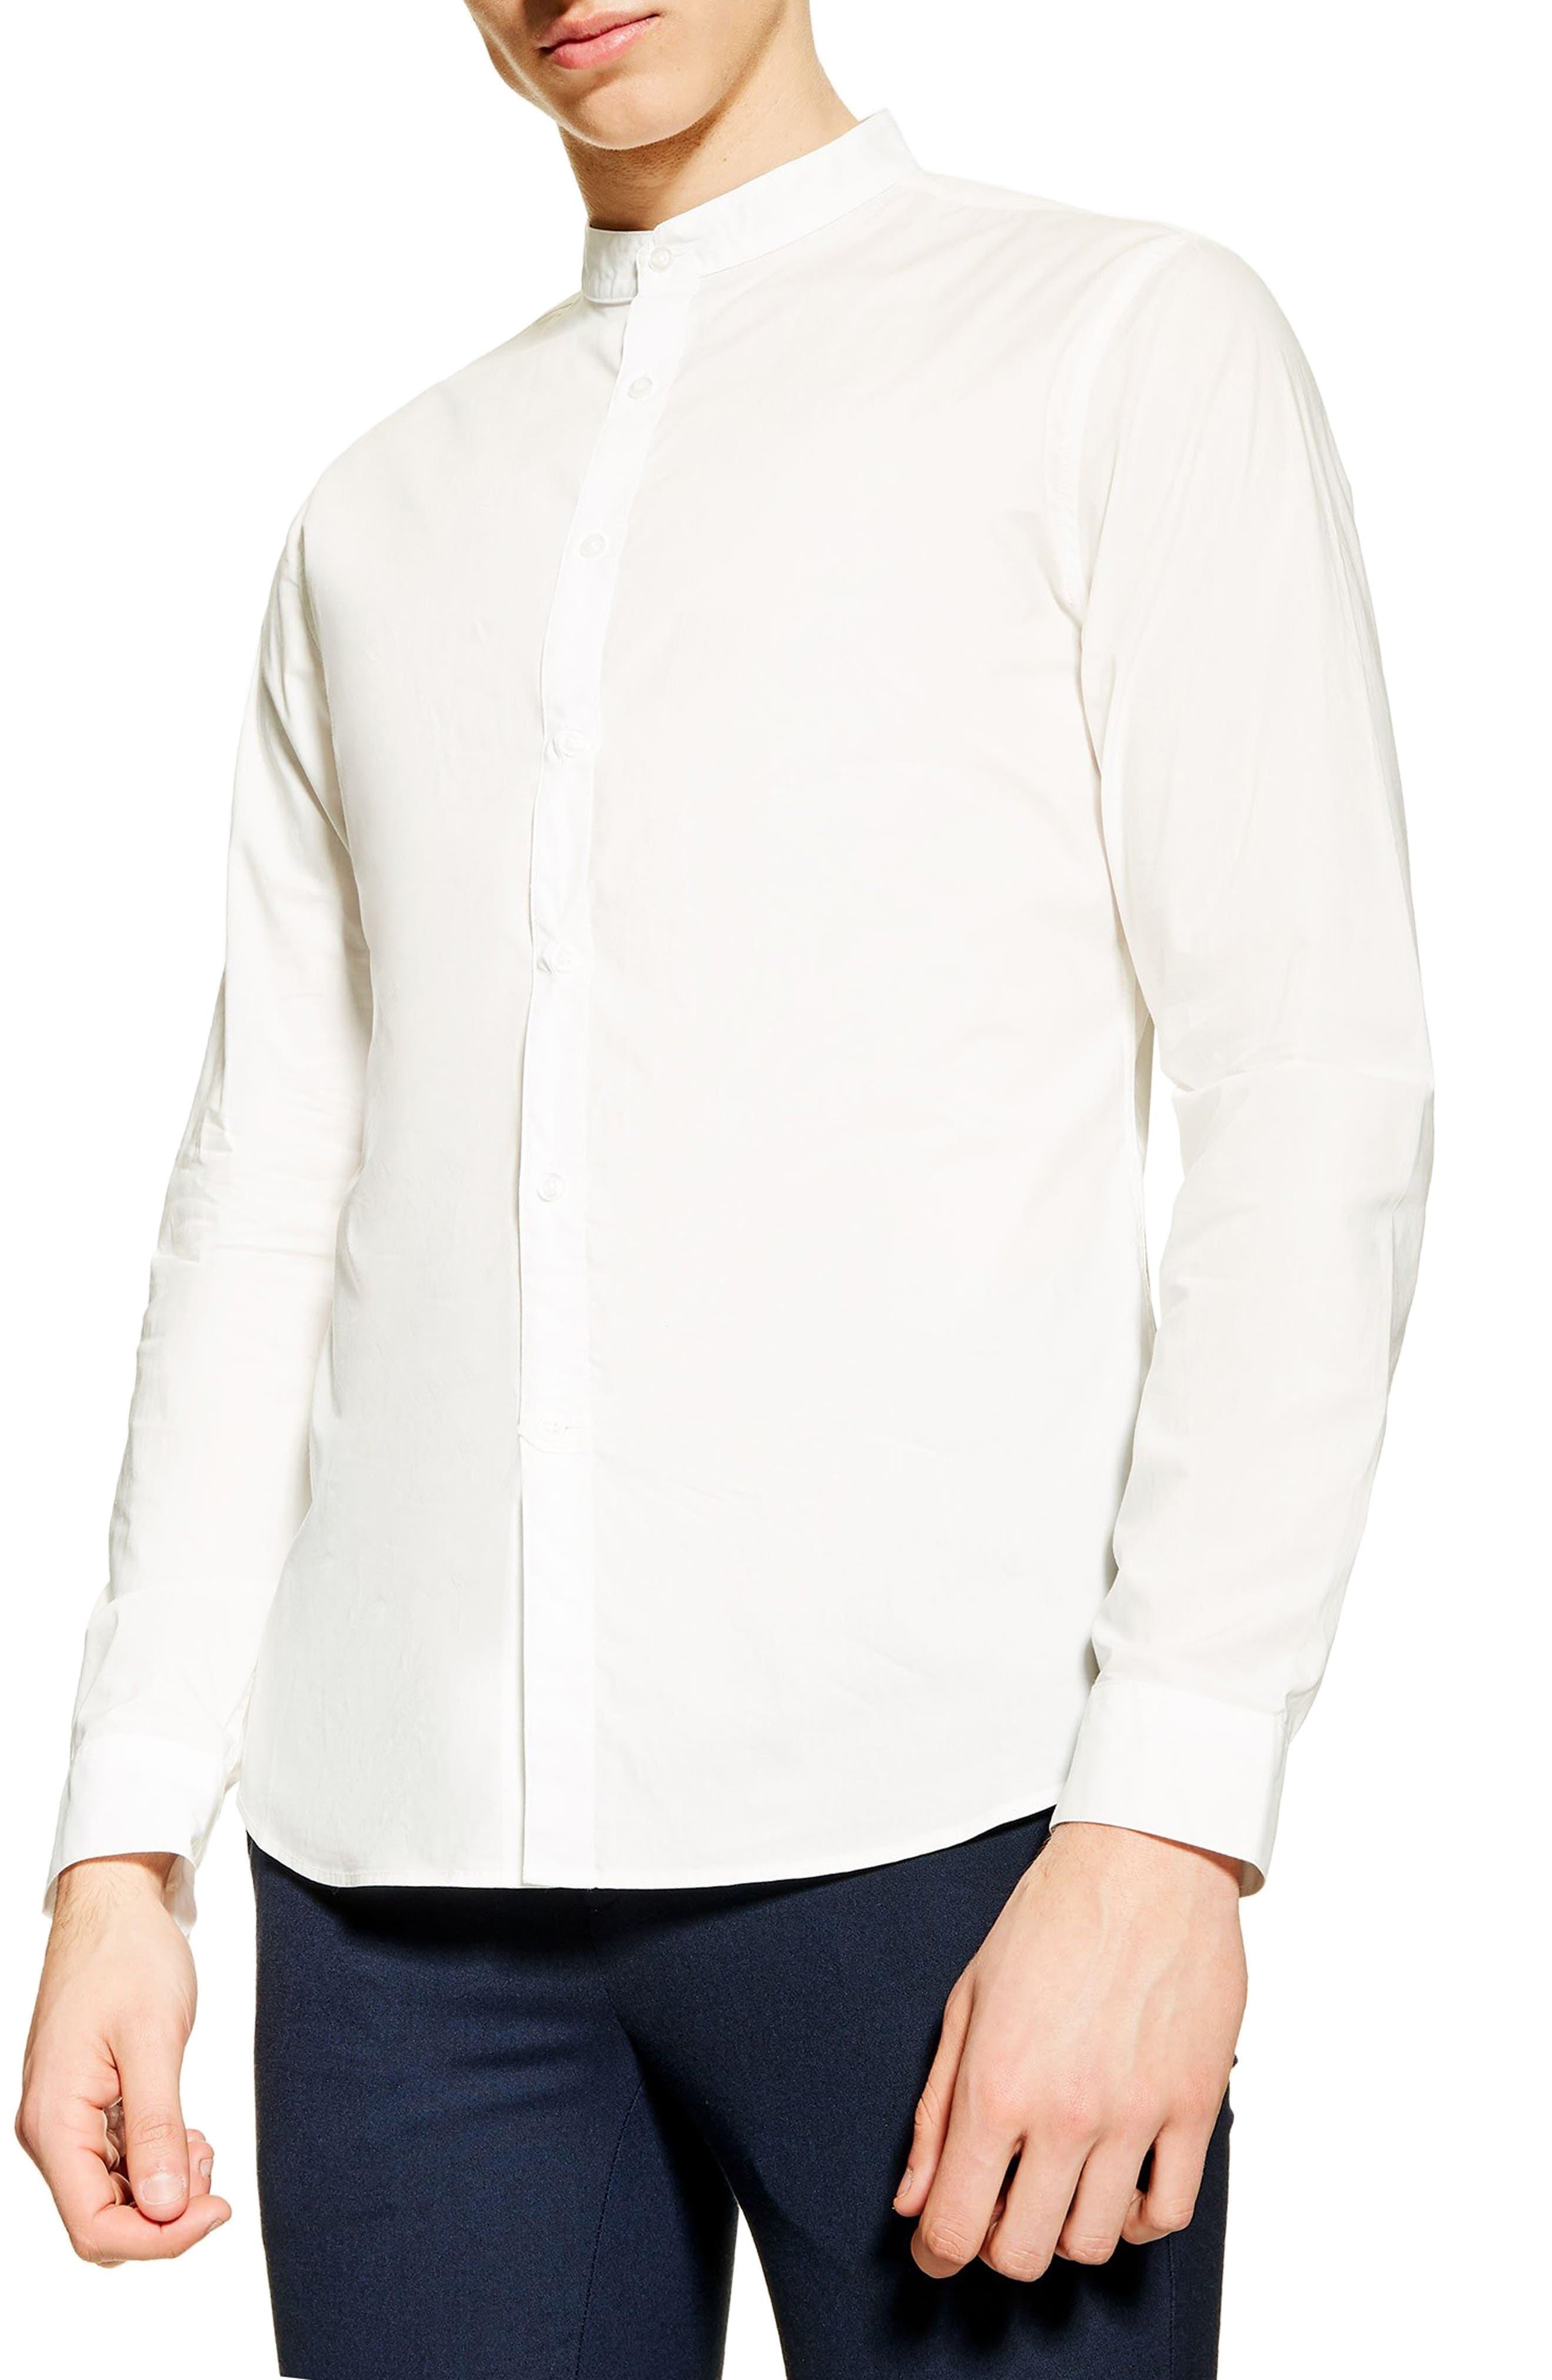 1920s Men's Dress Shirts Mens Topman Grandad Slim Poplin Shirt $32.98 AT vintagedancer.com